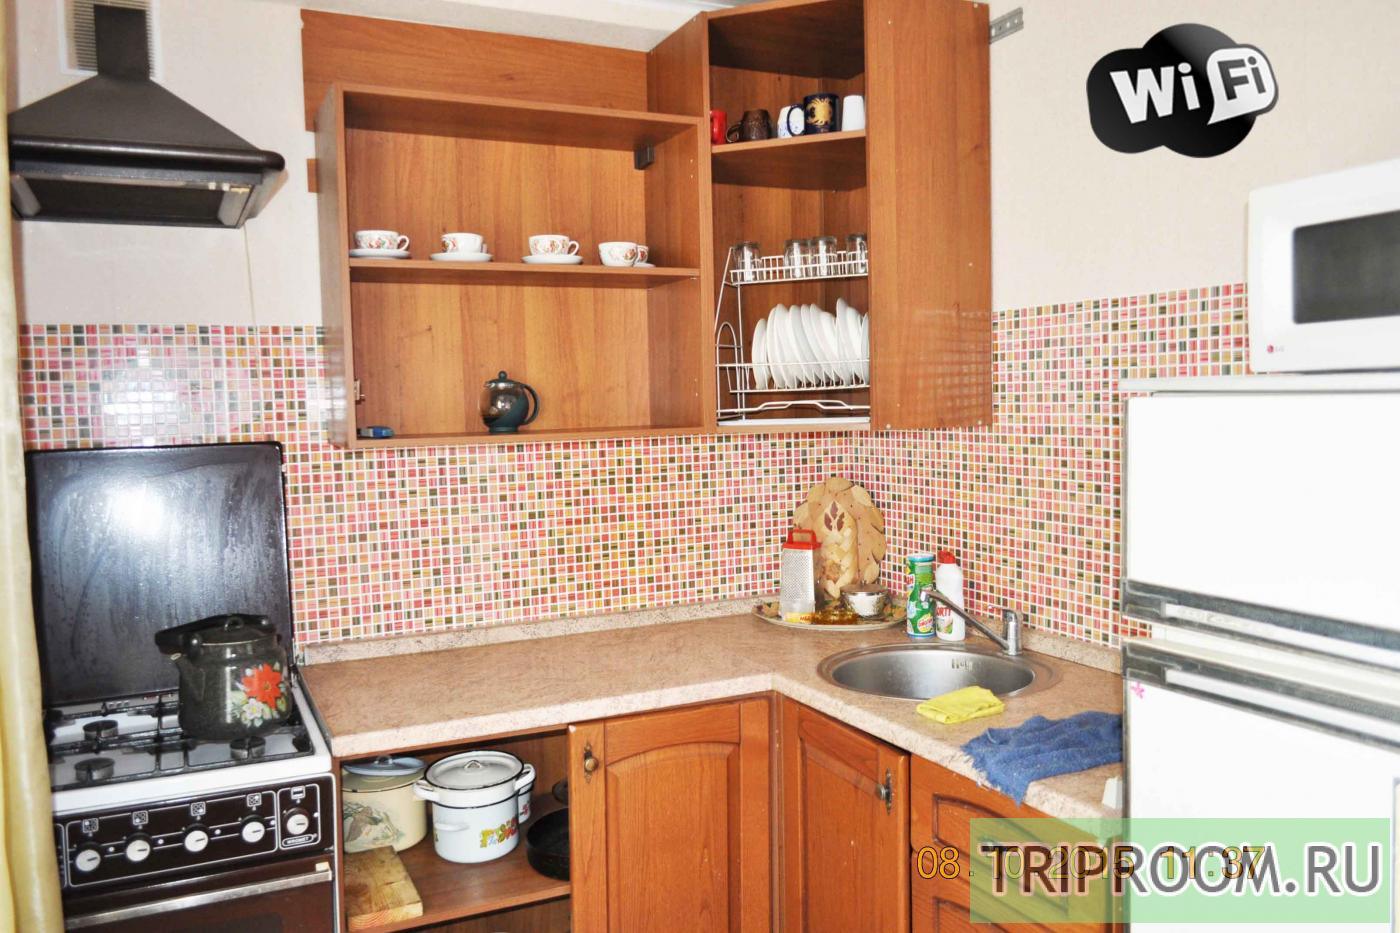 2-комнатная квартира посуточно (вариант № 11708), ул. Амосова улица, фото № 10